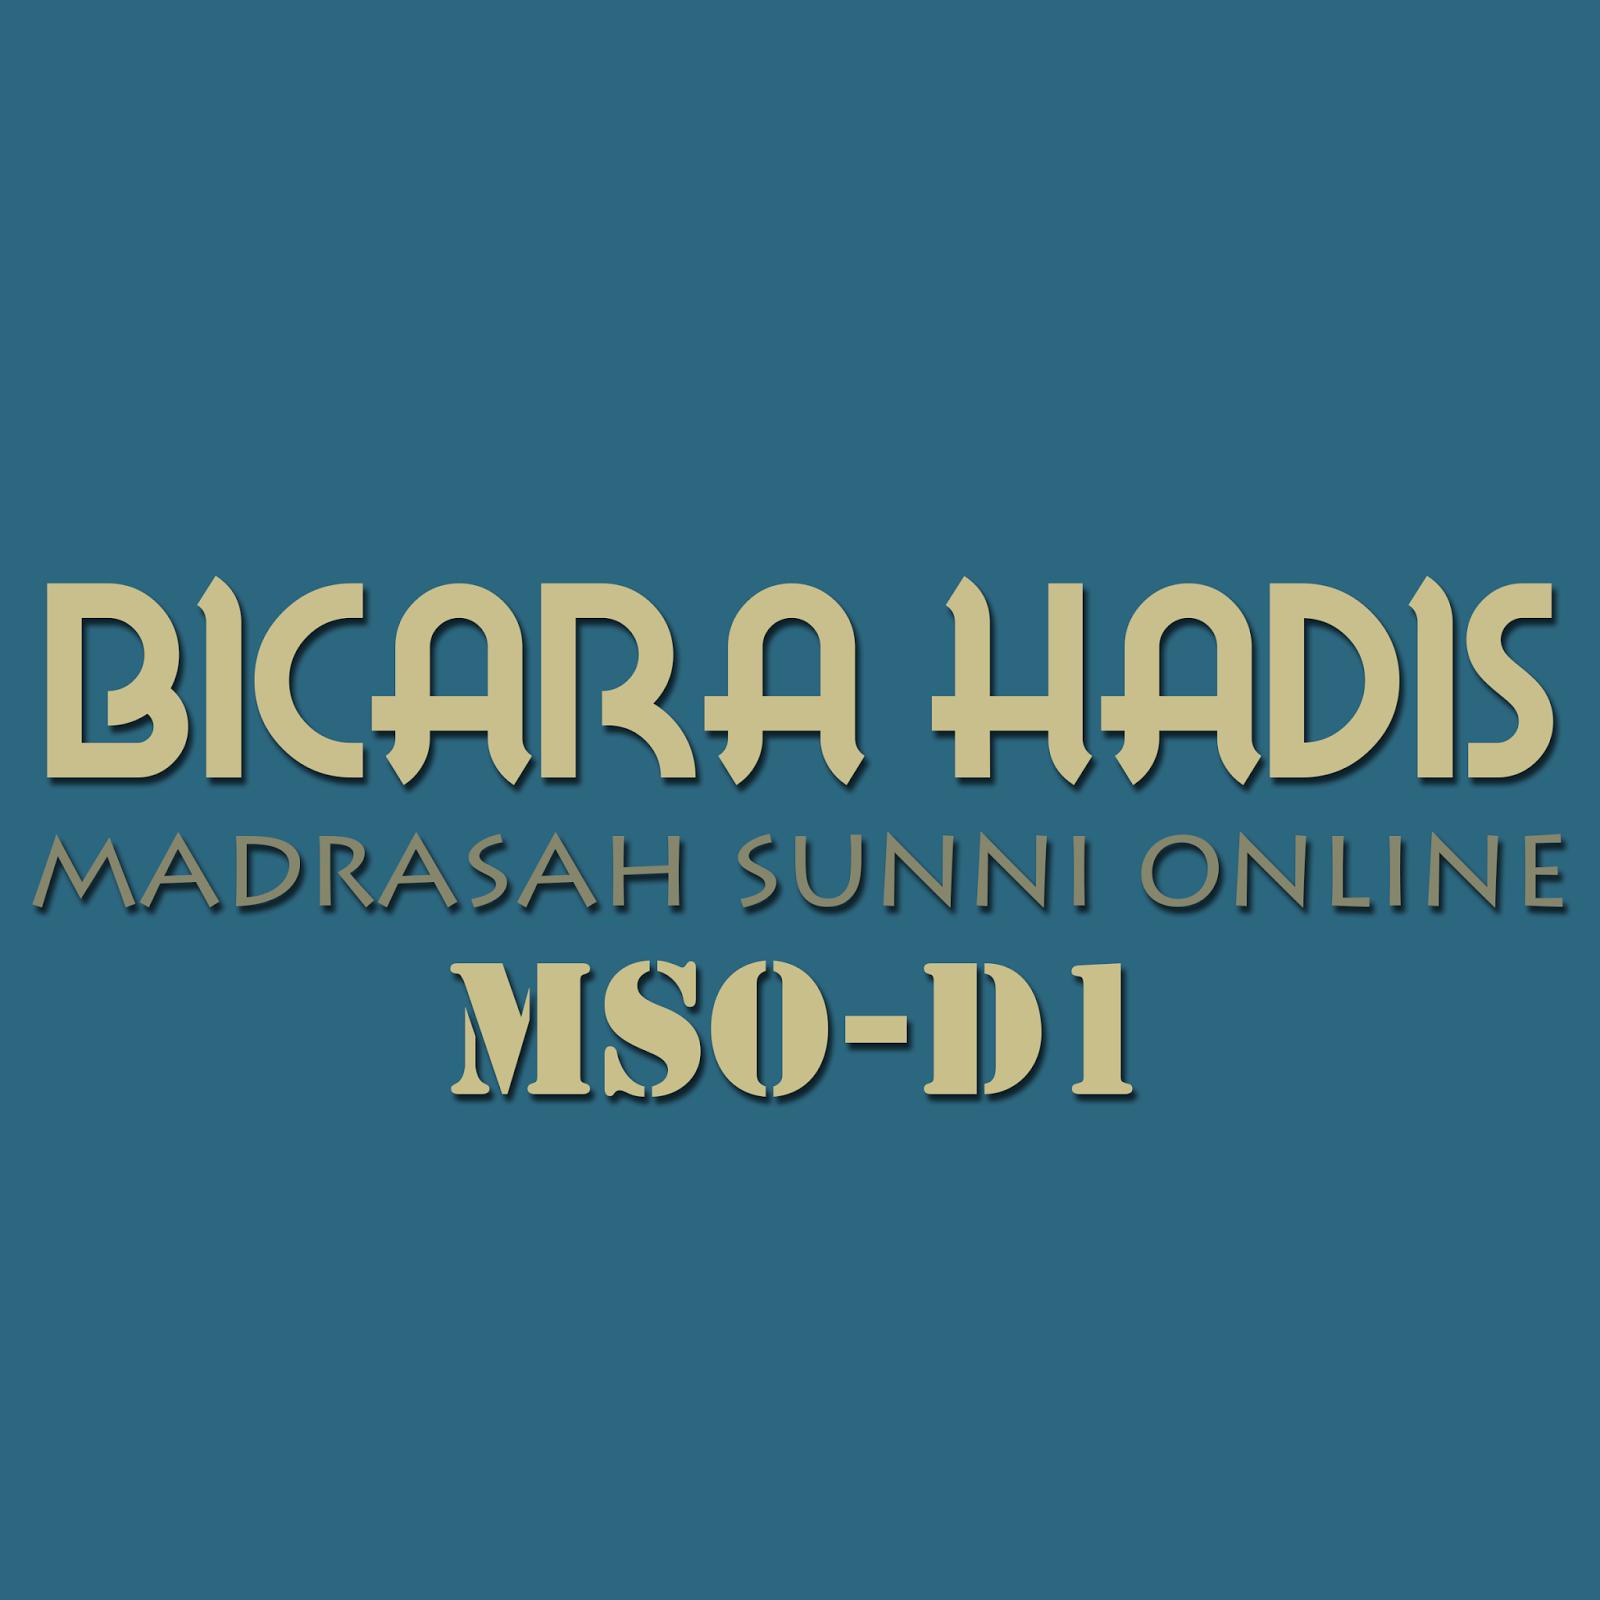 Hadith Berstatus Sangat Dhaif Dhaif Jiddan Mso